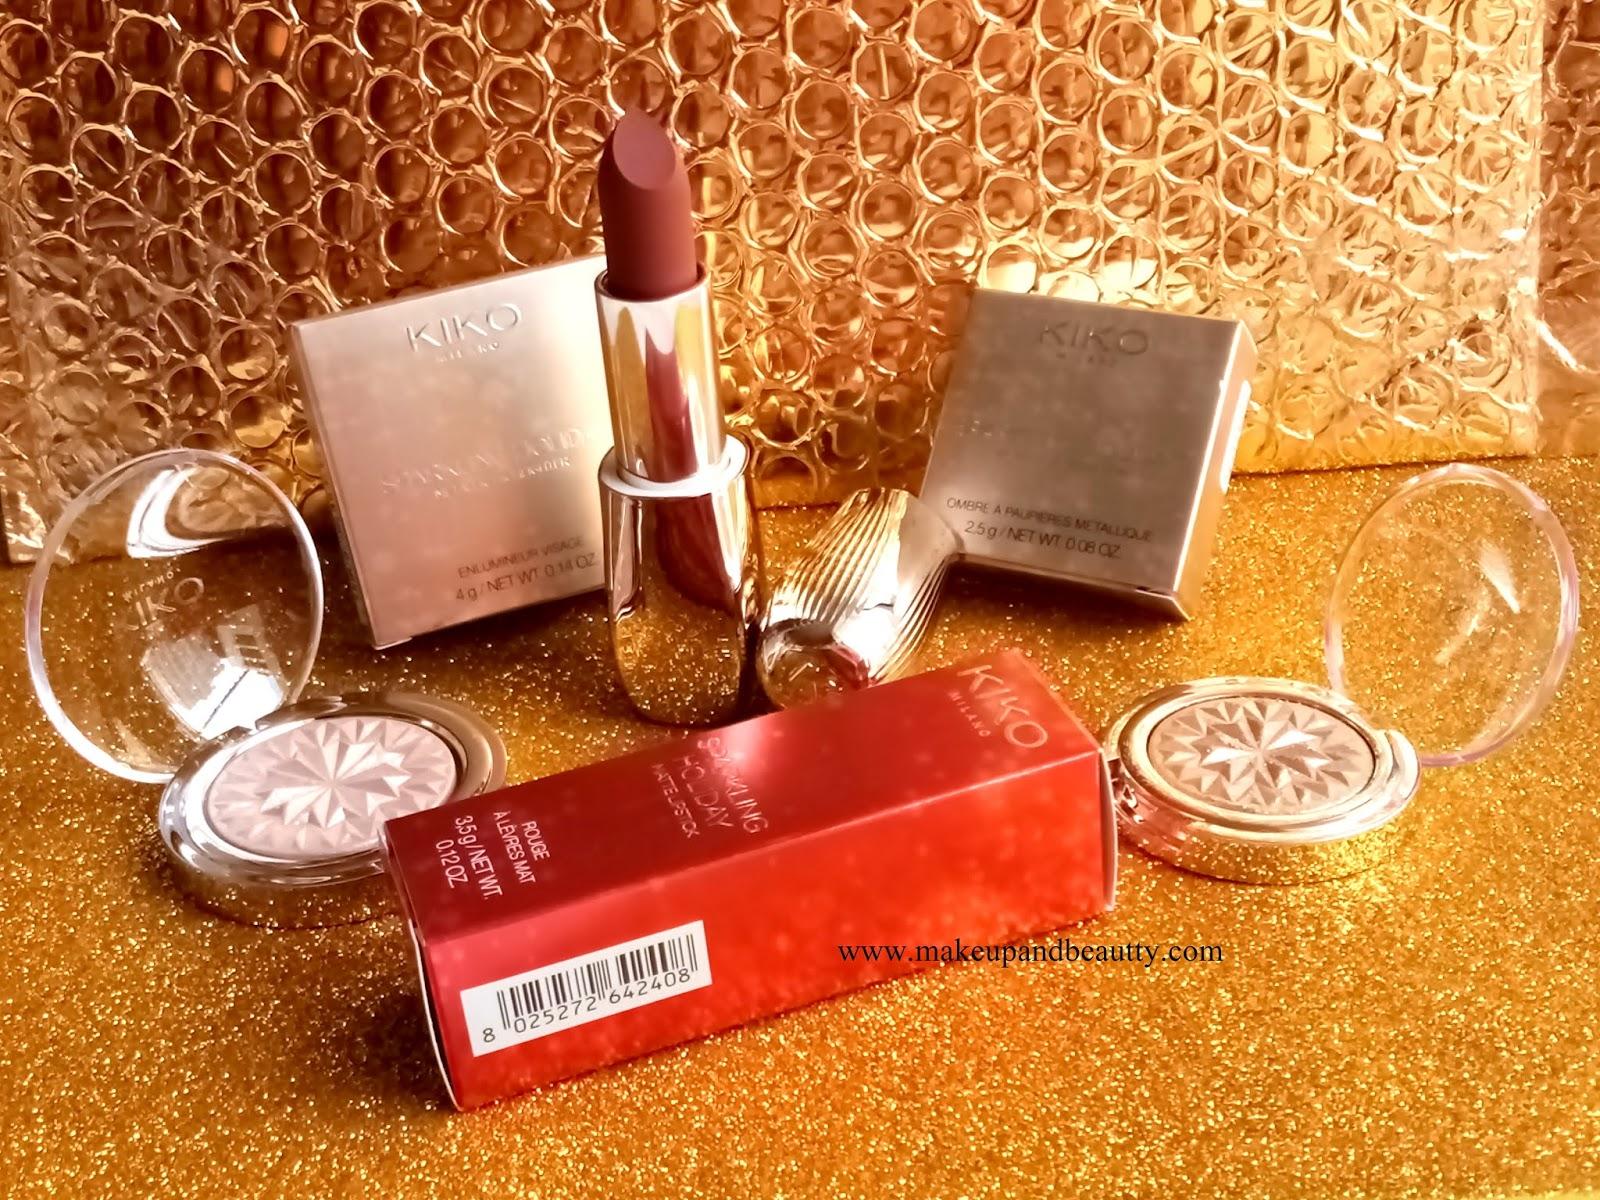 Lipstick Palette - 01 Every Day Colors by Kiko Milano #17